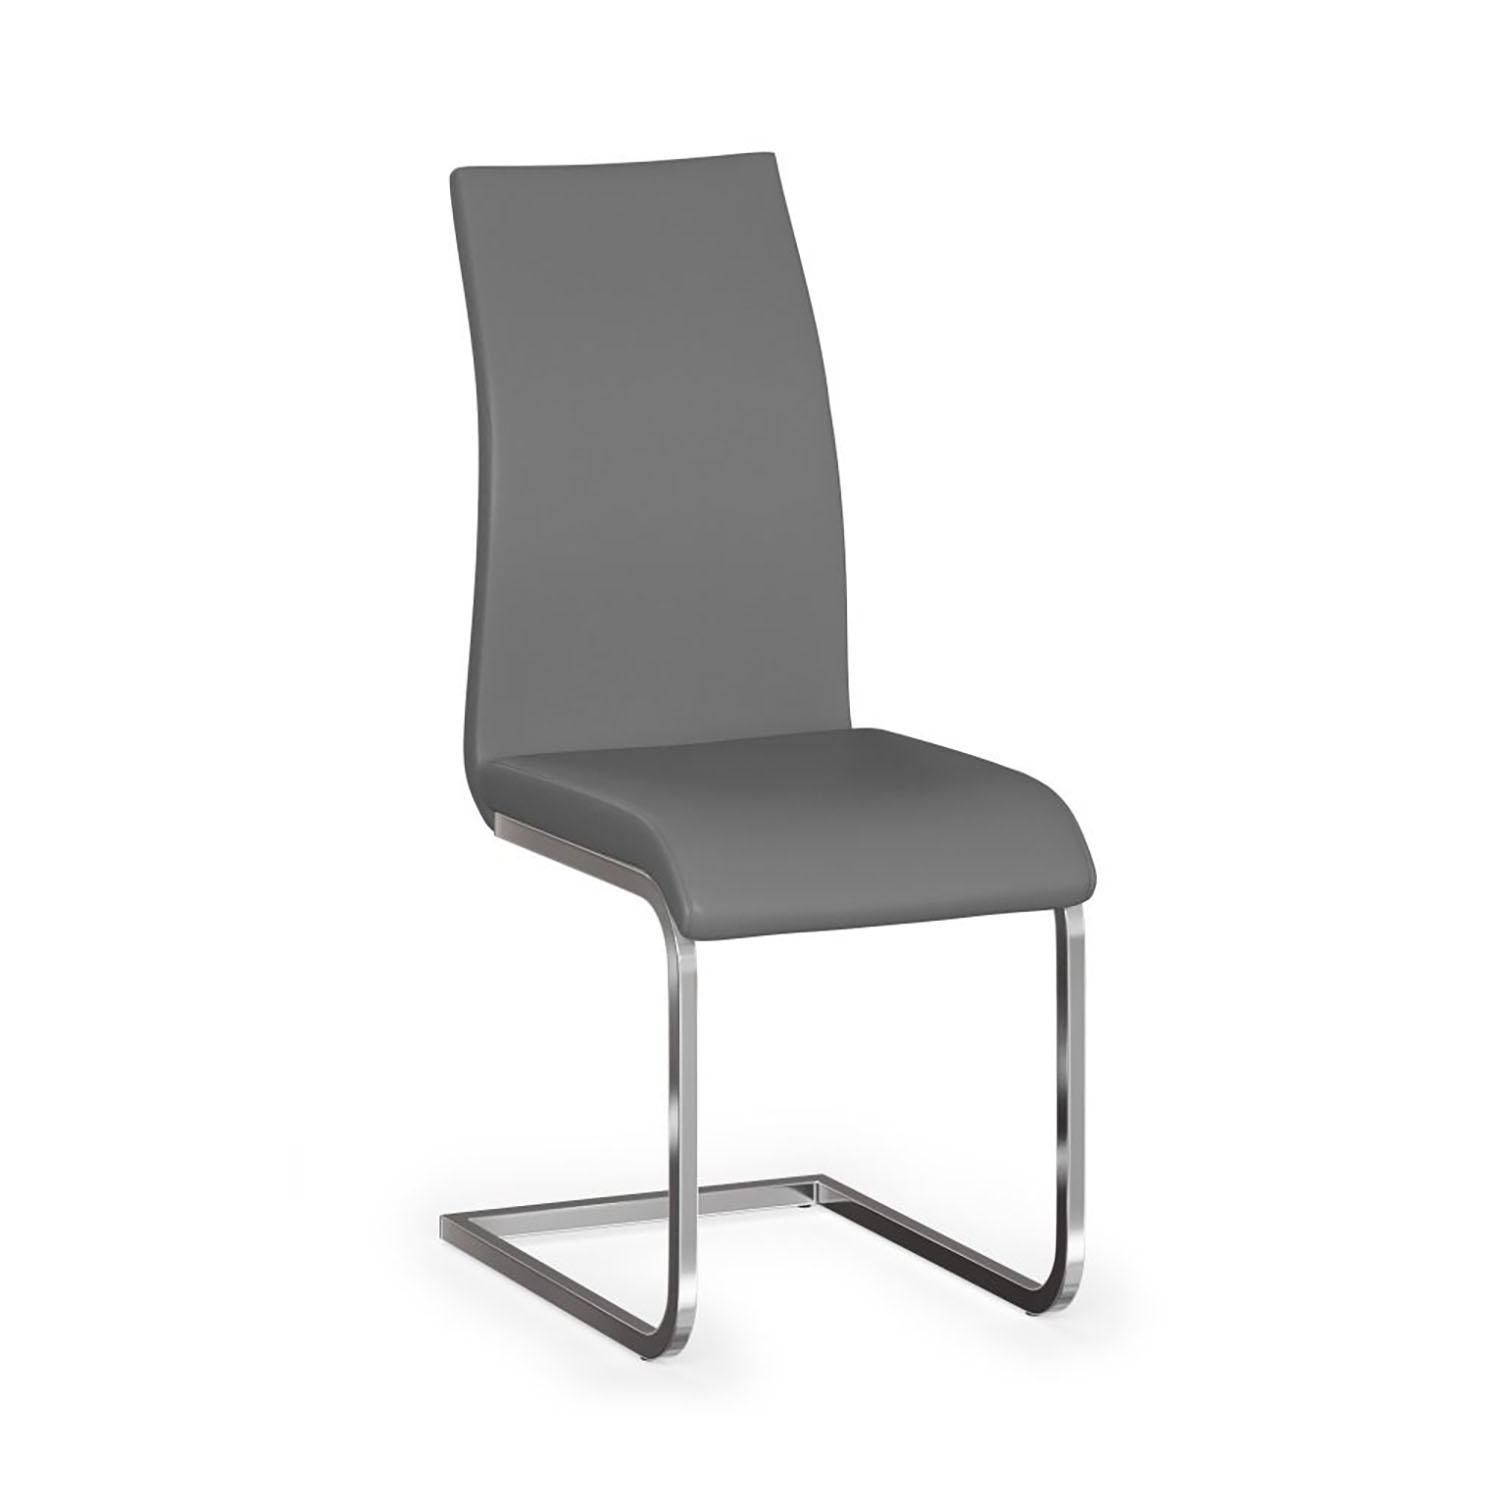 Bucharest Dining Chair - Grey